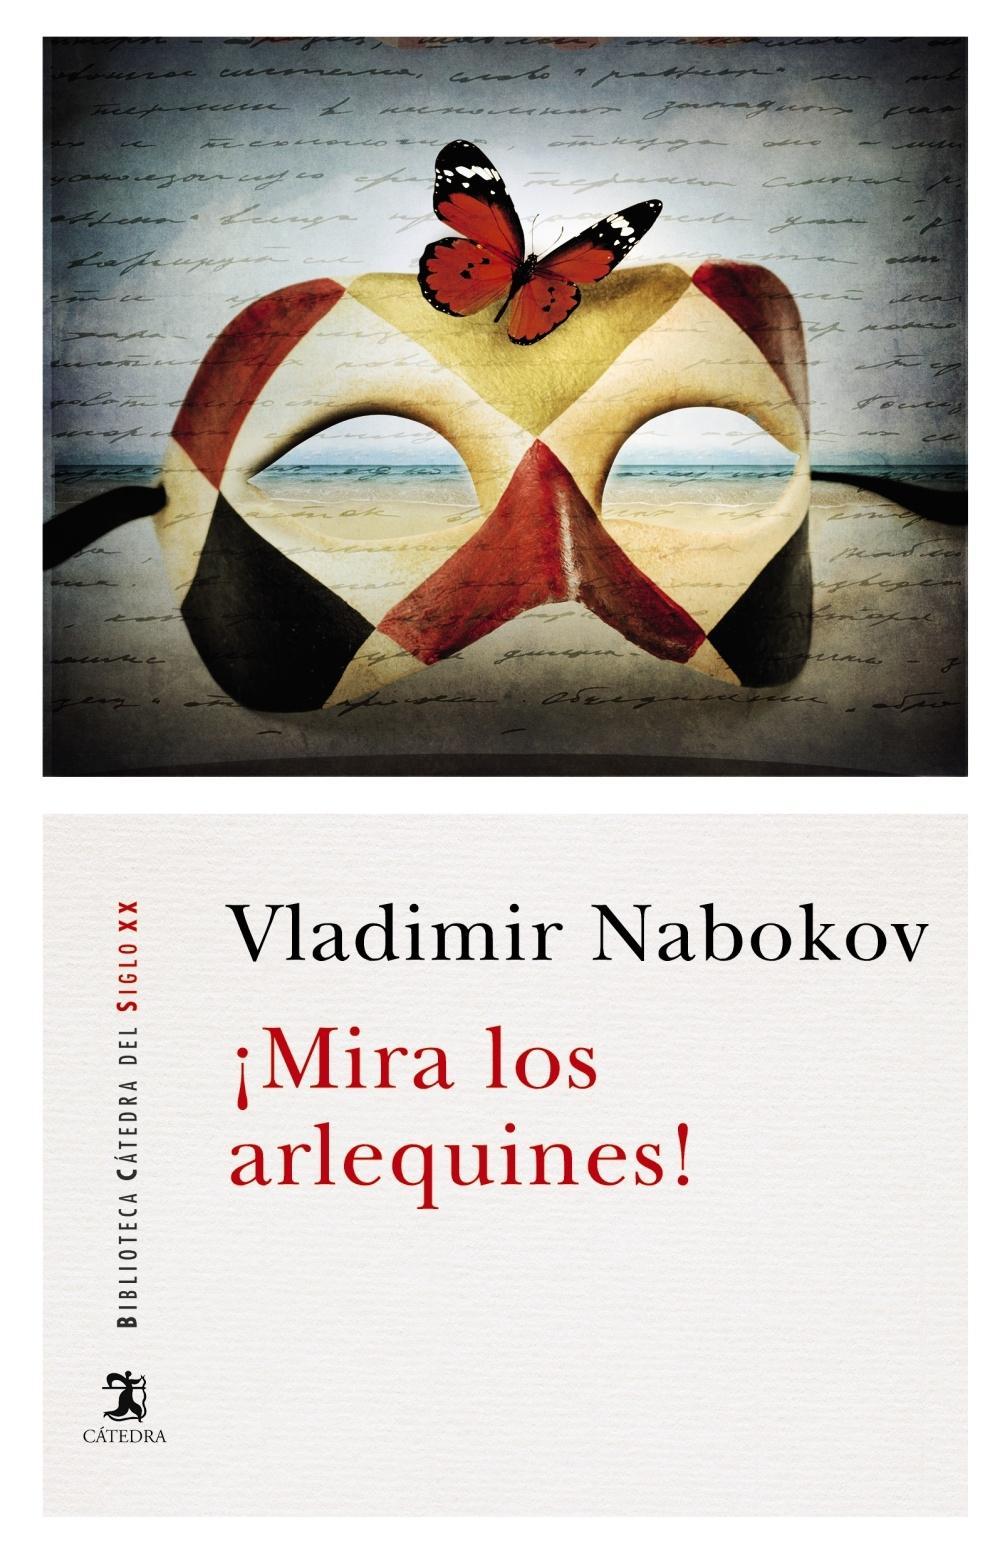 '¡Mira los arlequines!' de Vladimir Nabokov